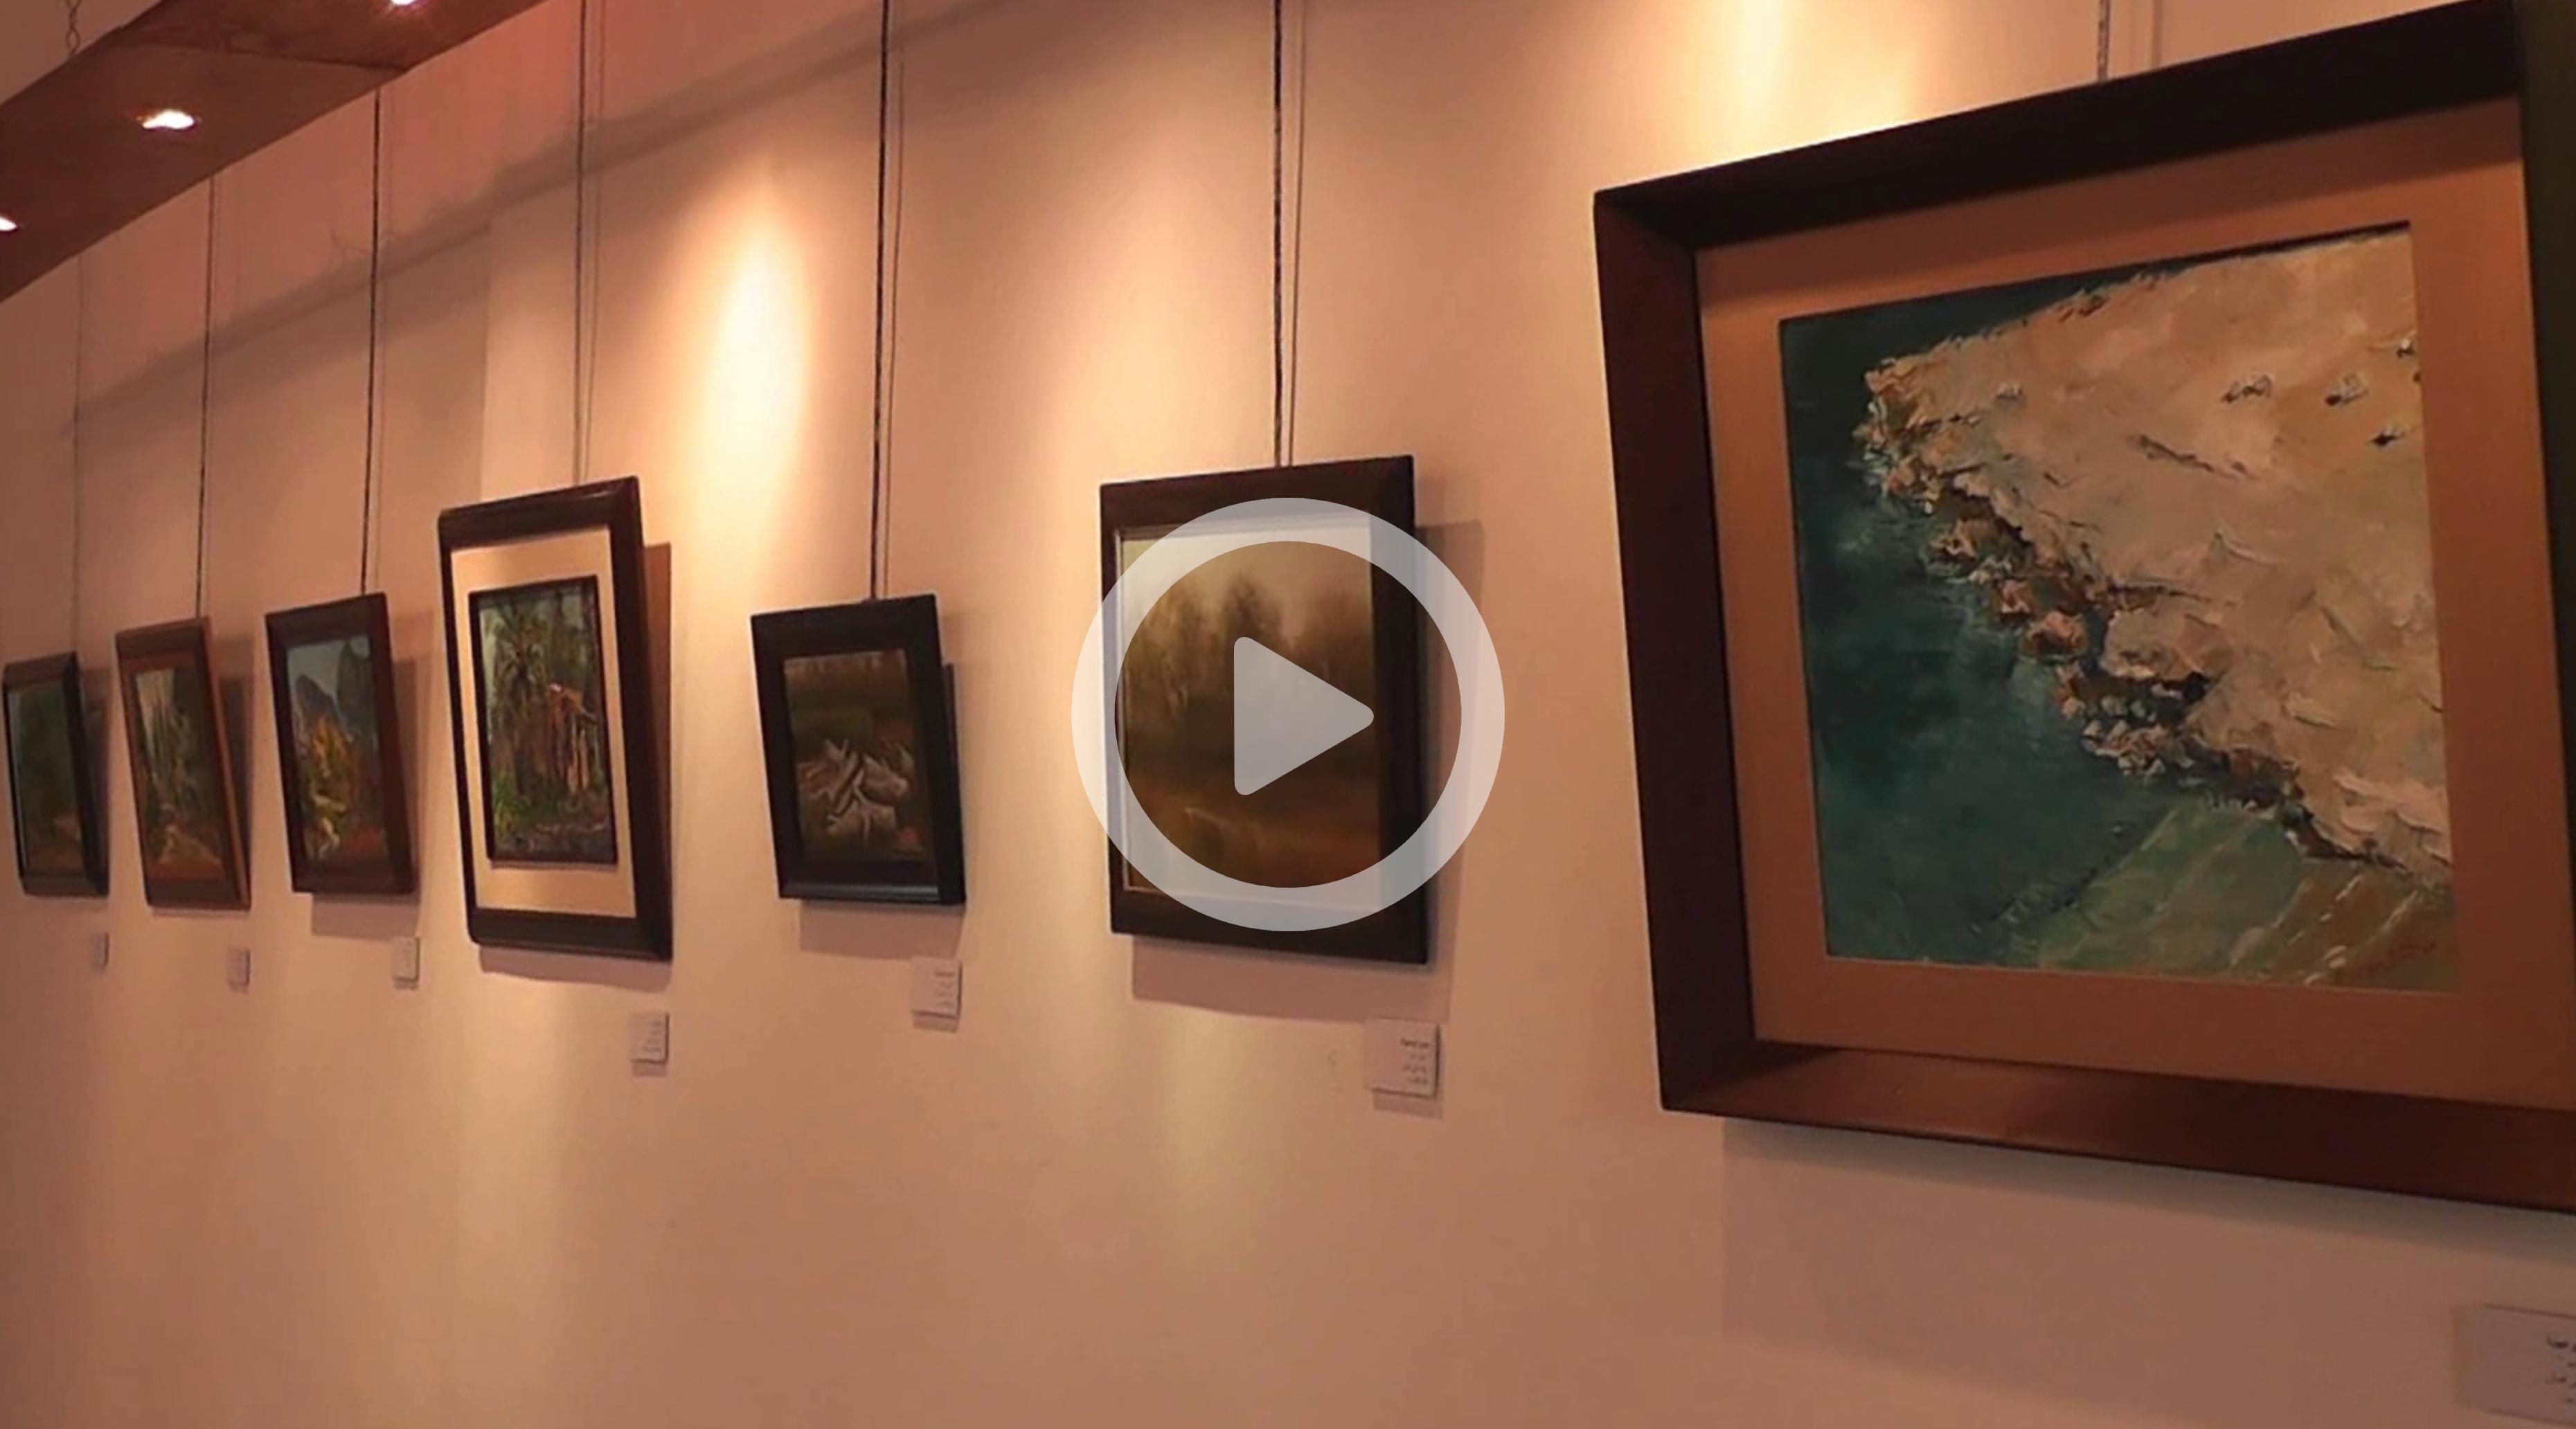 معرض فني بطرابلس